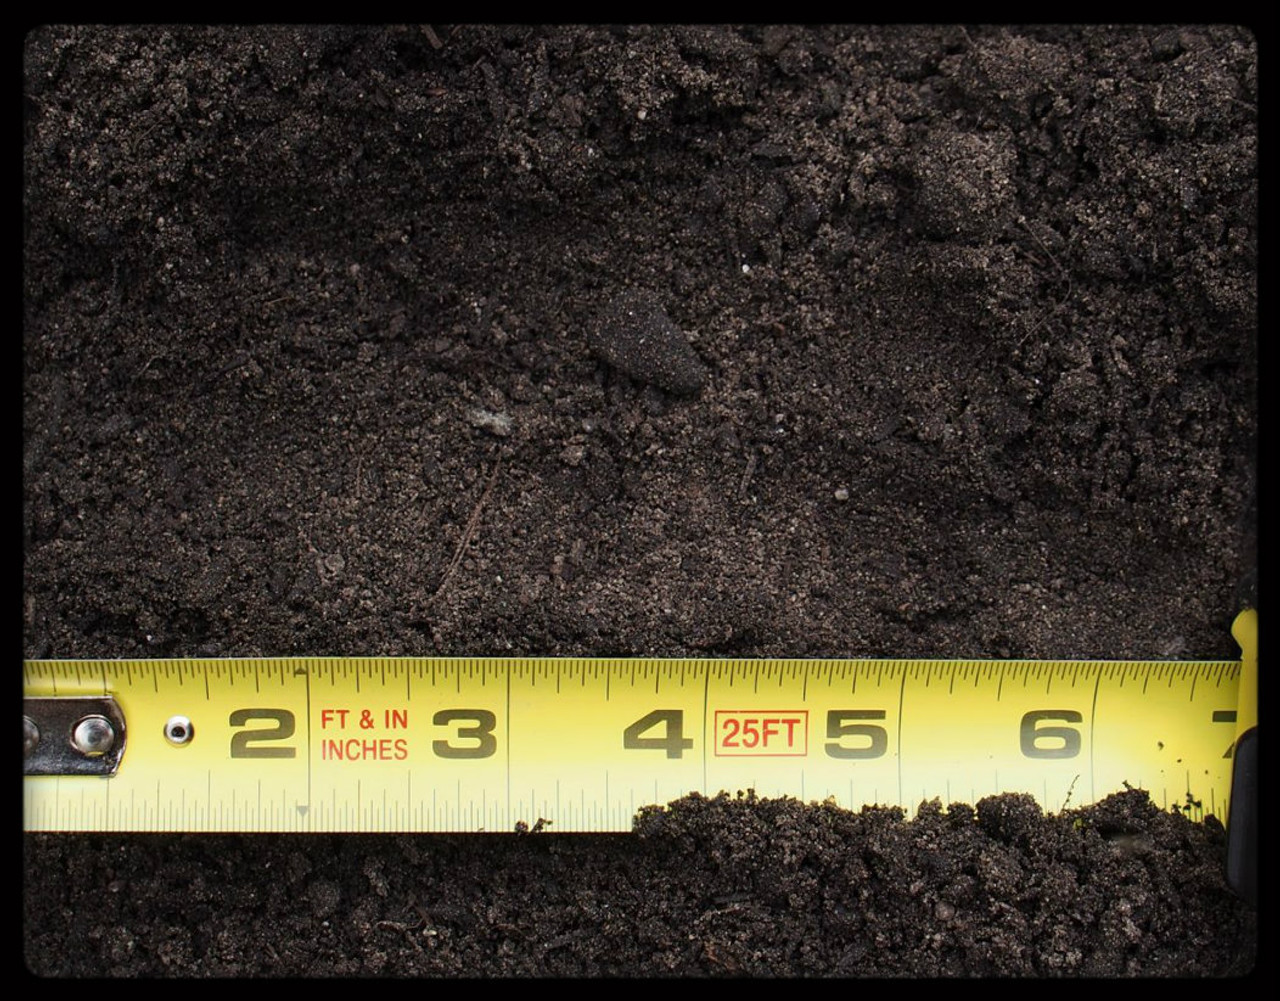 Turf Blend Soil scale photo - MyGardenBag